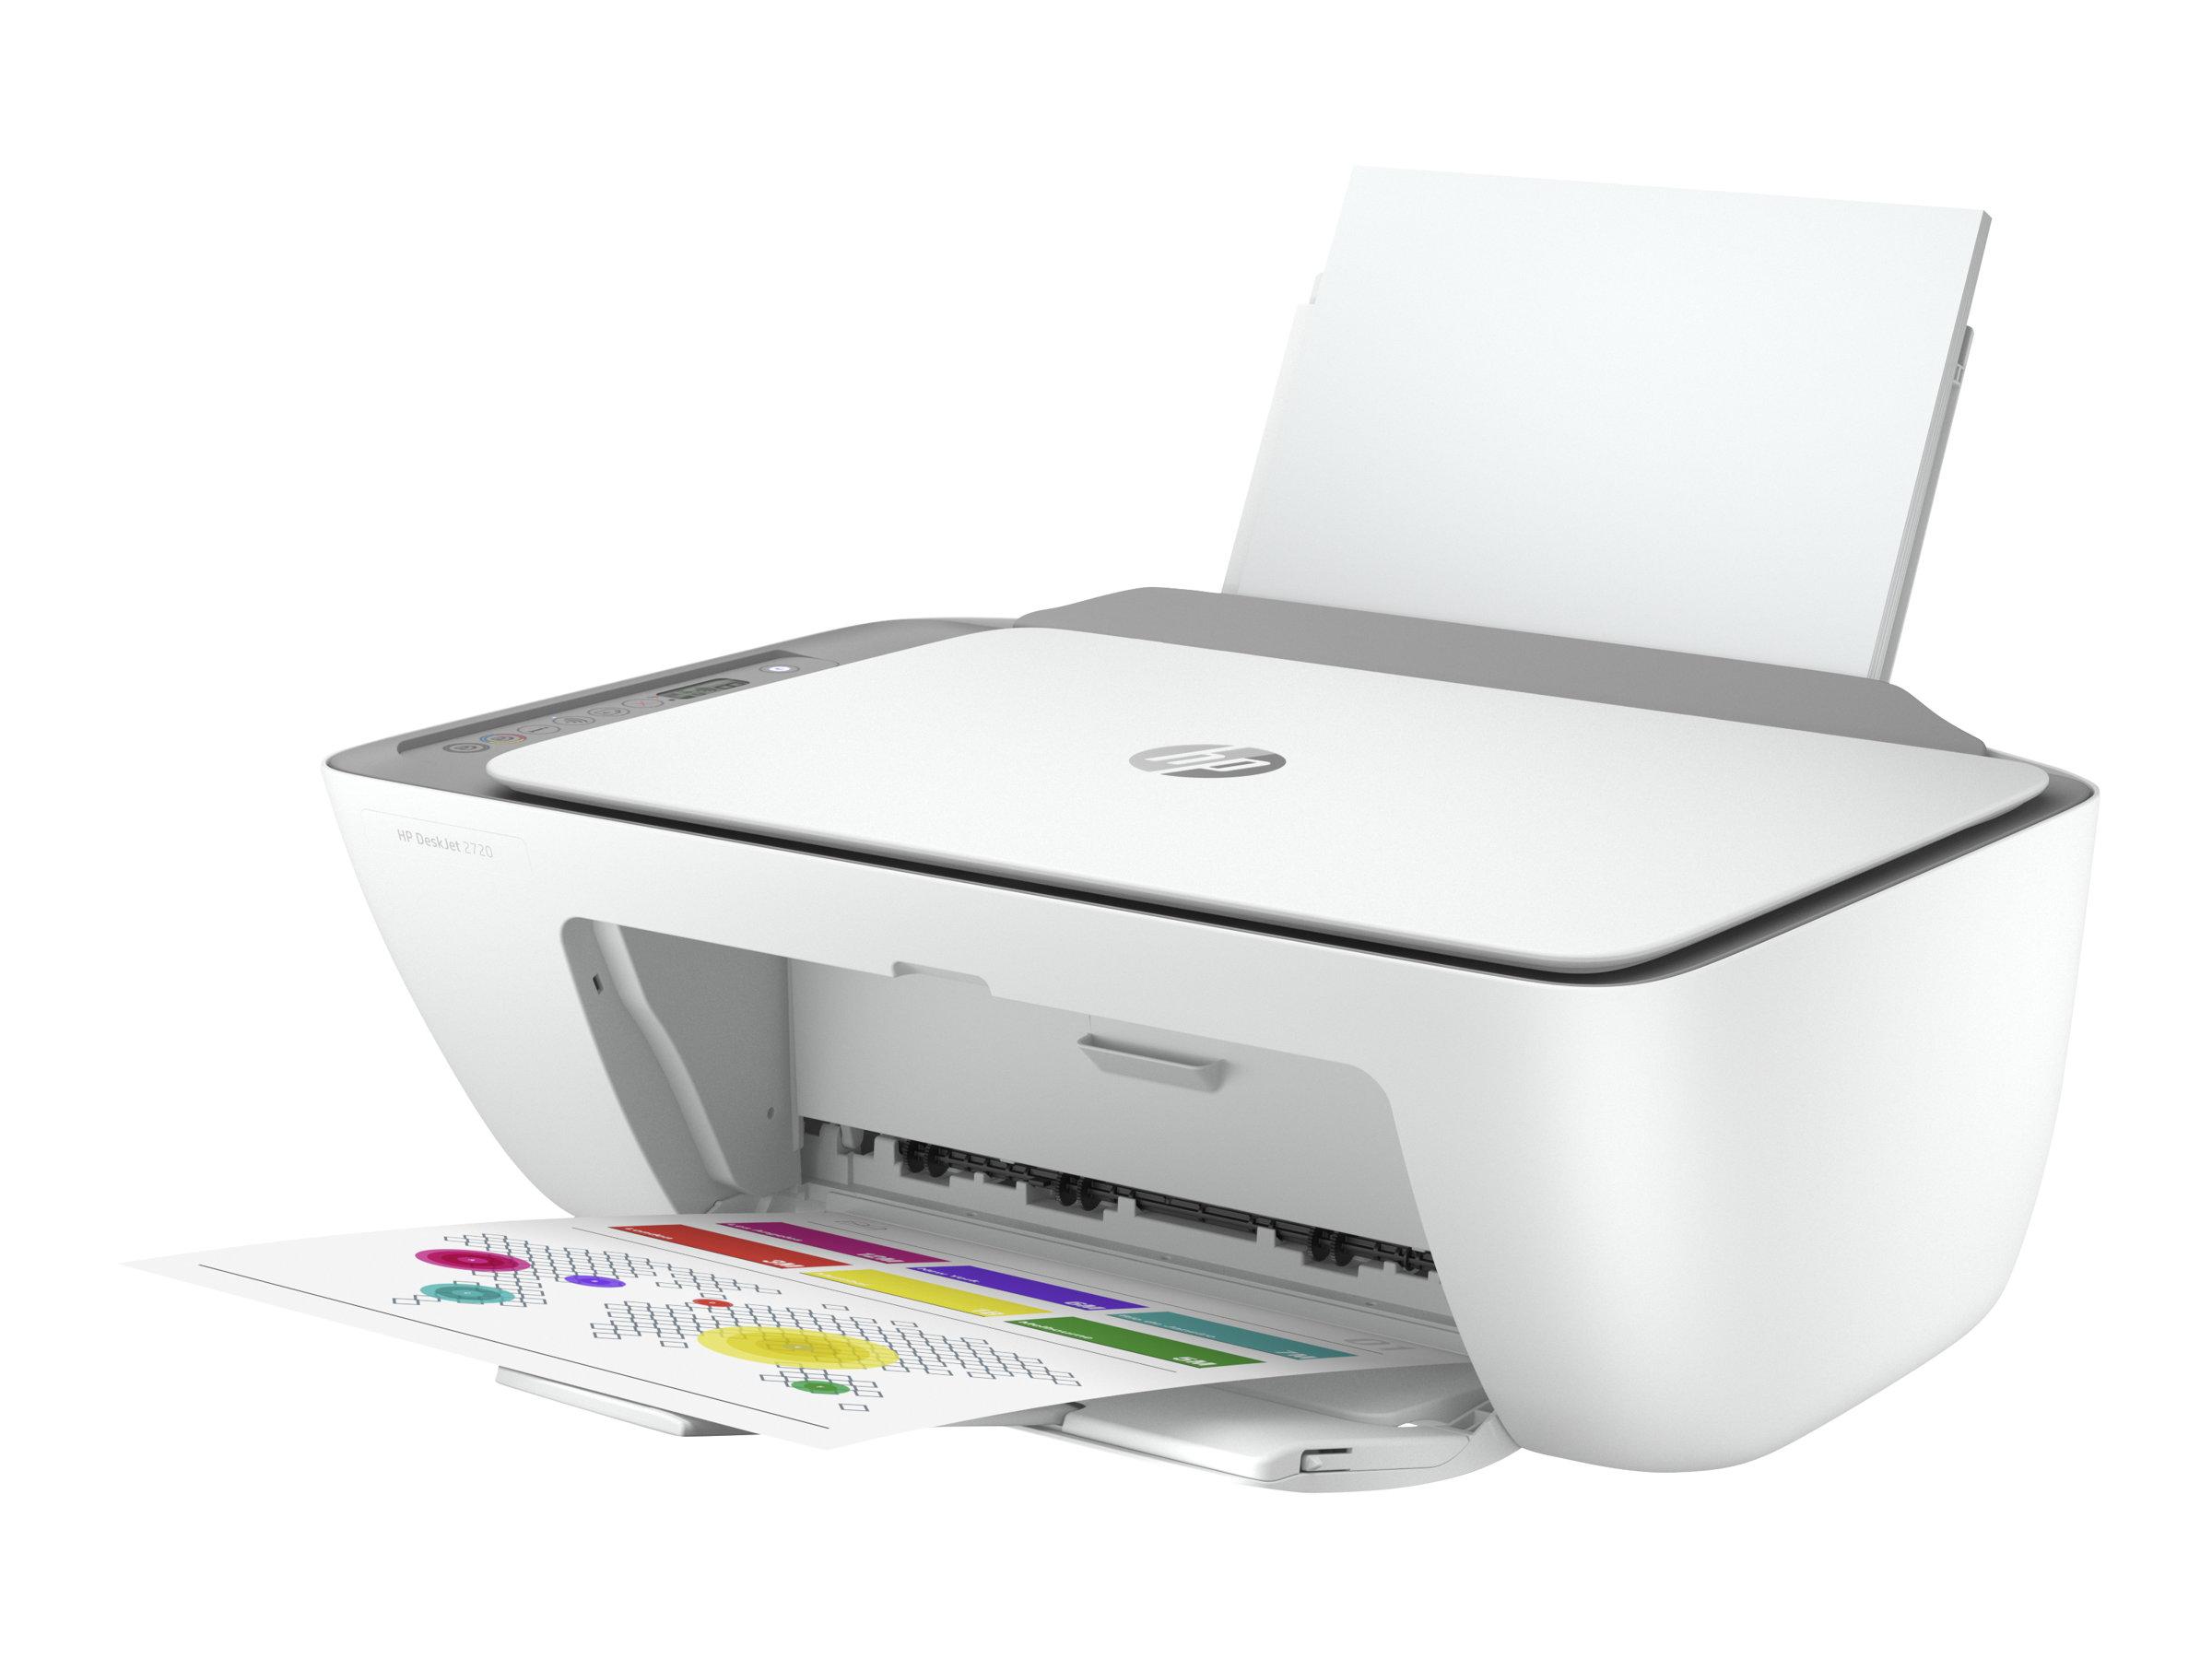 HP Deskjet 2720 All-in-One - Multifunktionsdrucker - Farbe - Tintenstrahl - 216 x 297 mm (Original) - A4/Legal (Medien)